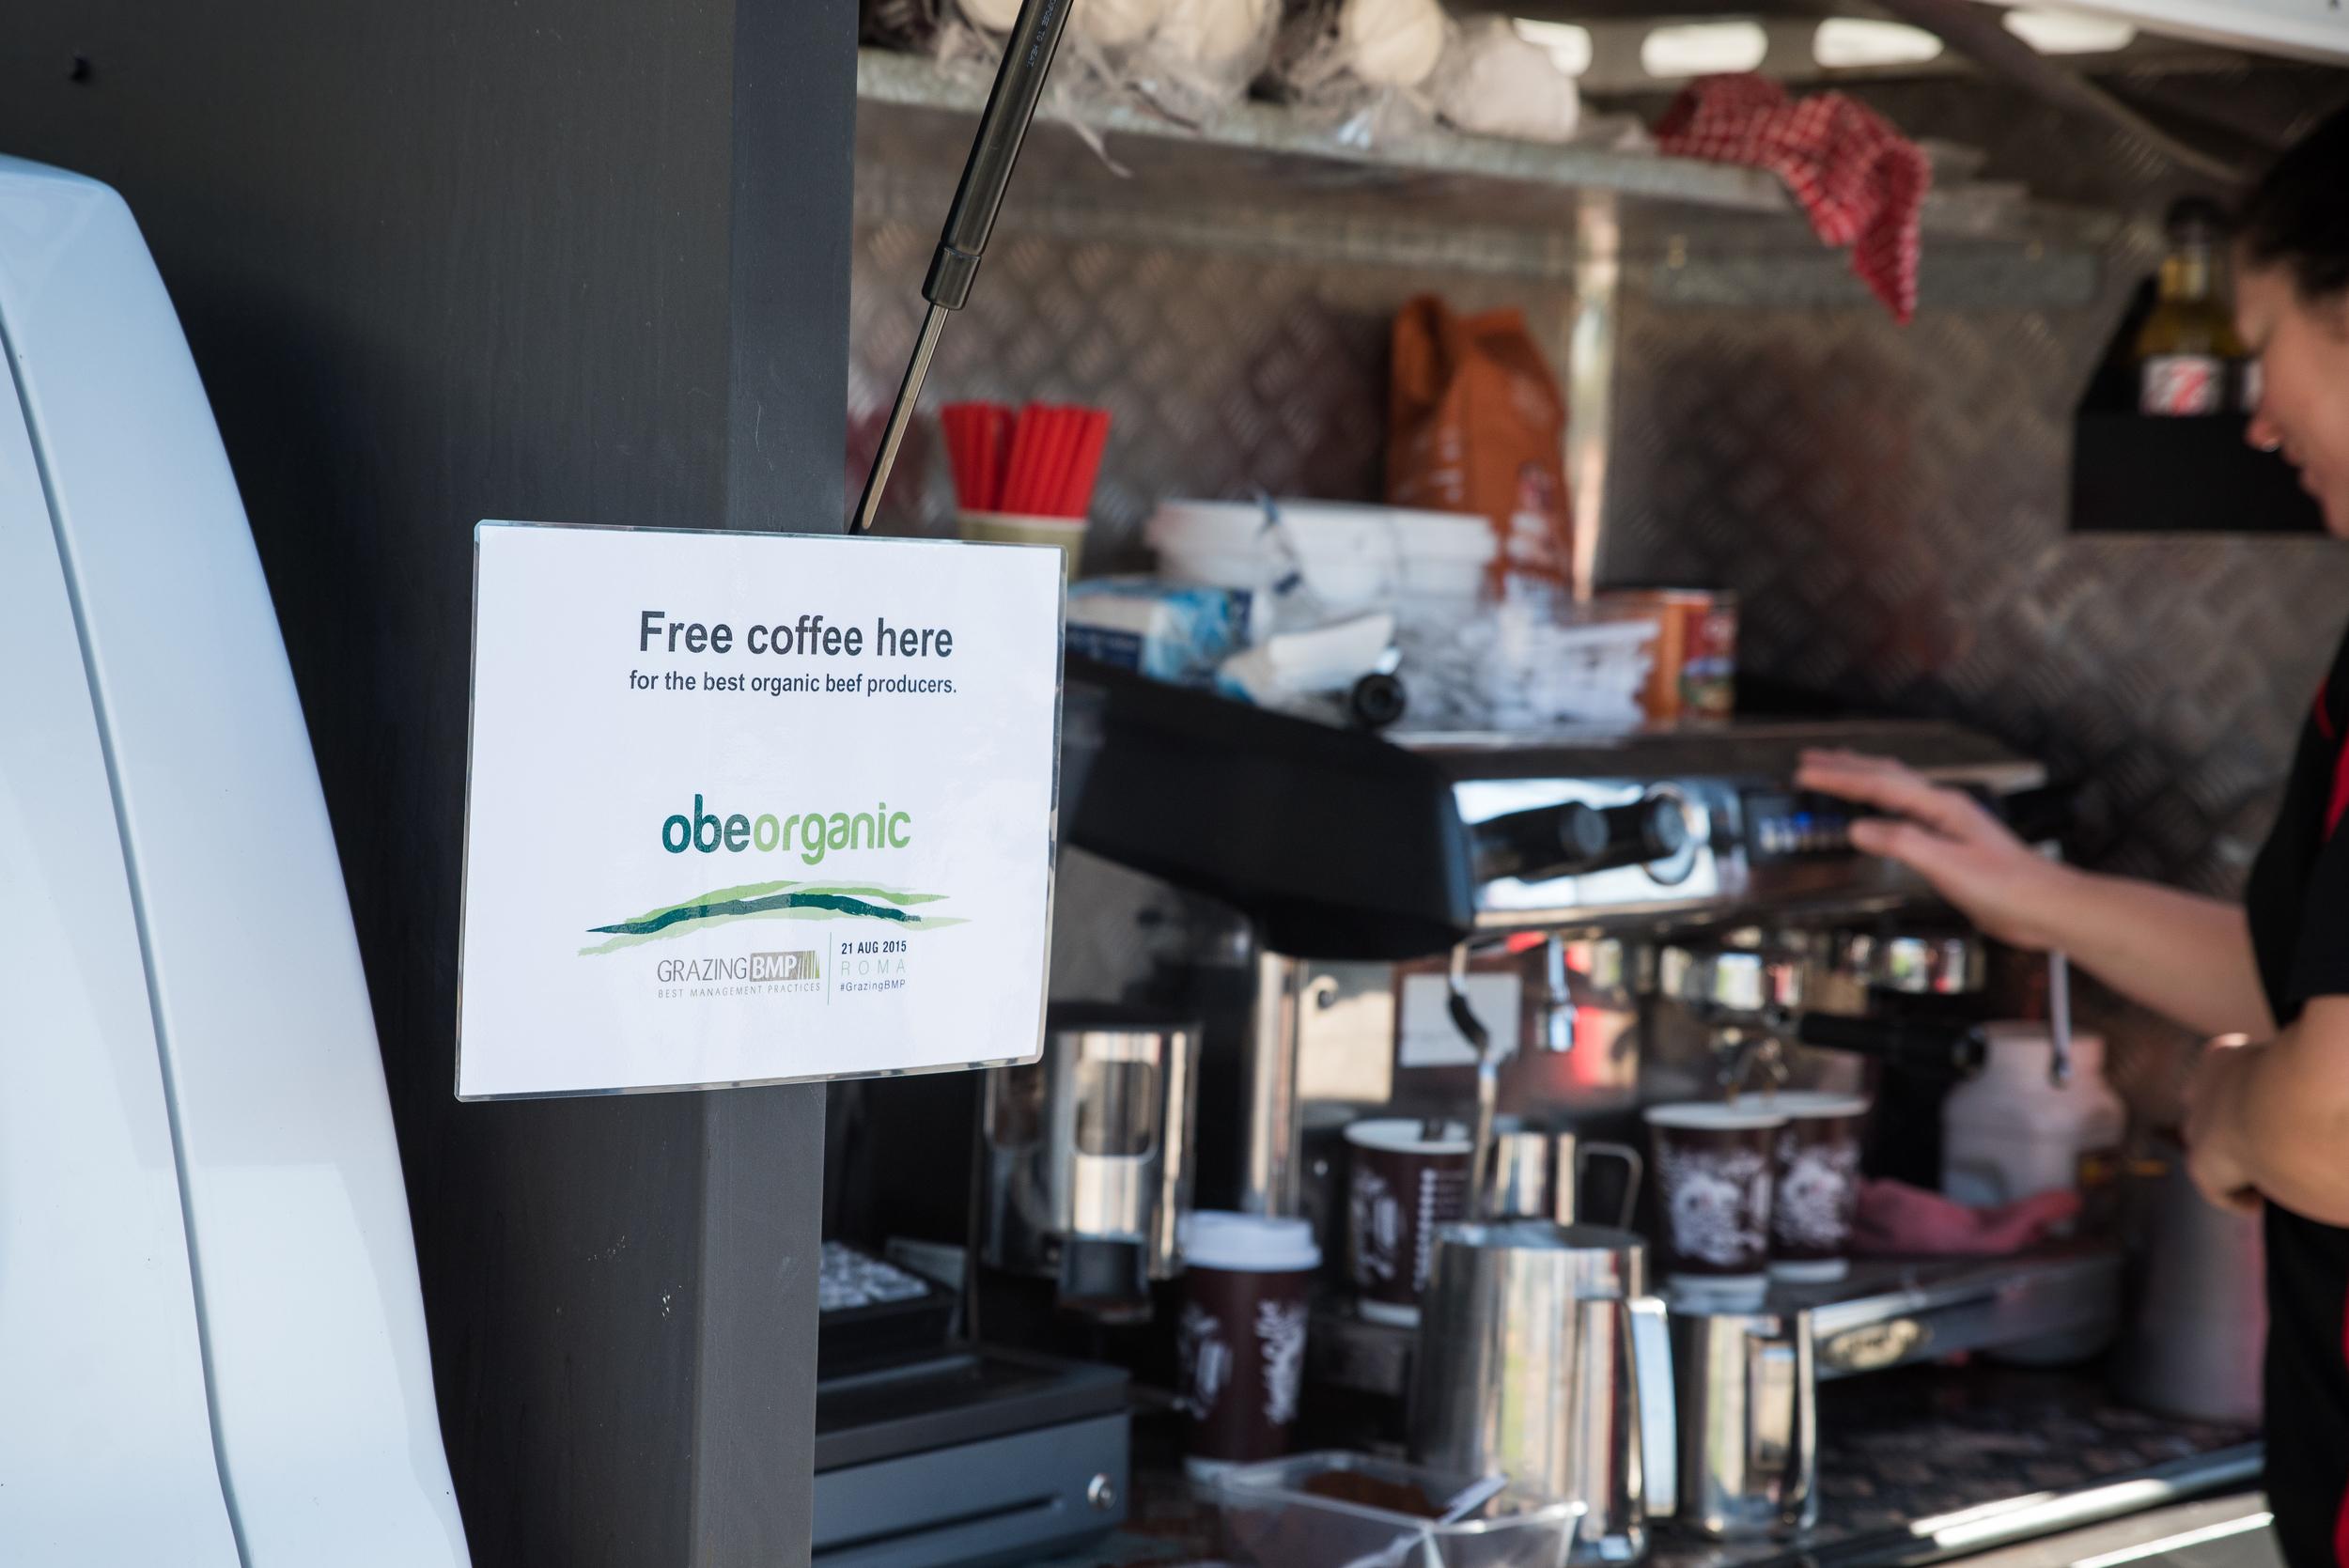 Photo source: OBE Organic